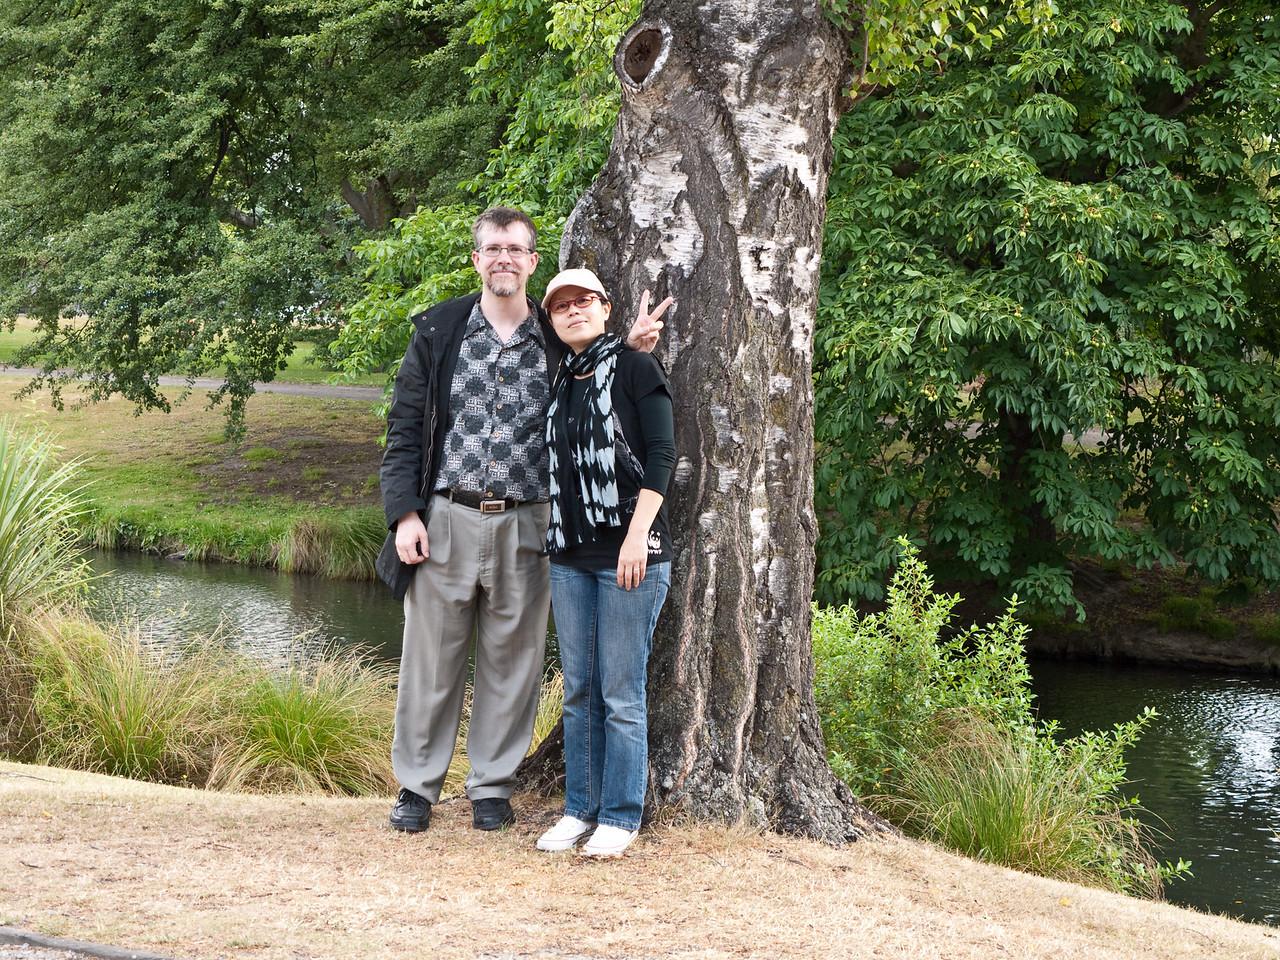 In the Botanic Gardens, Christchurch